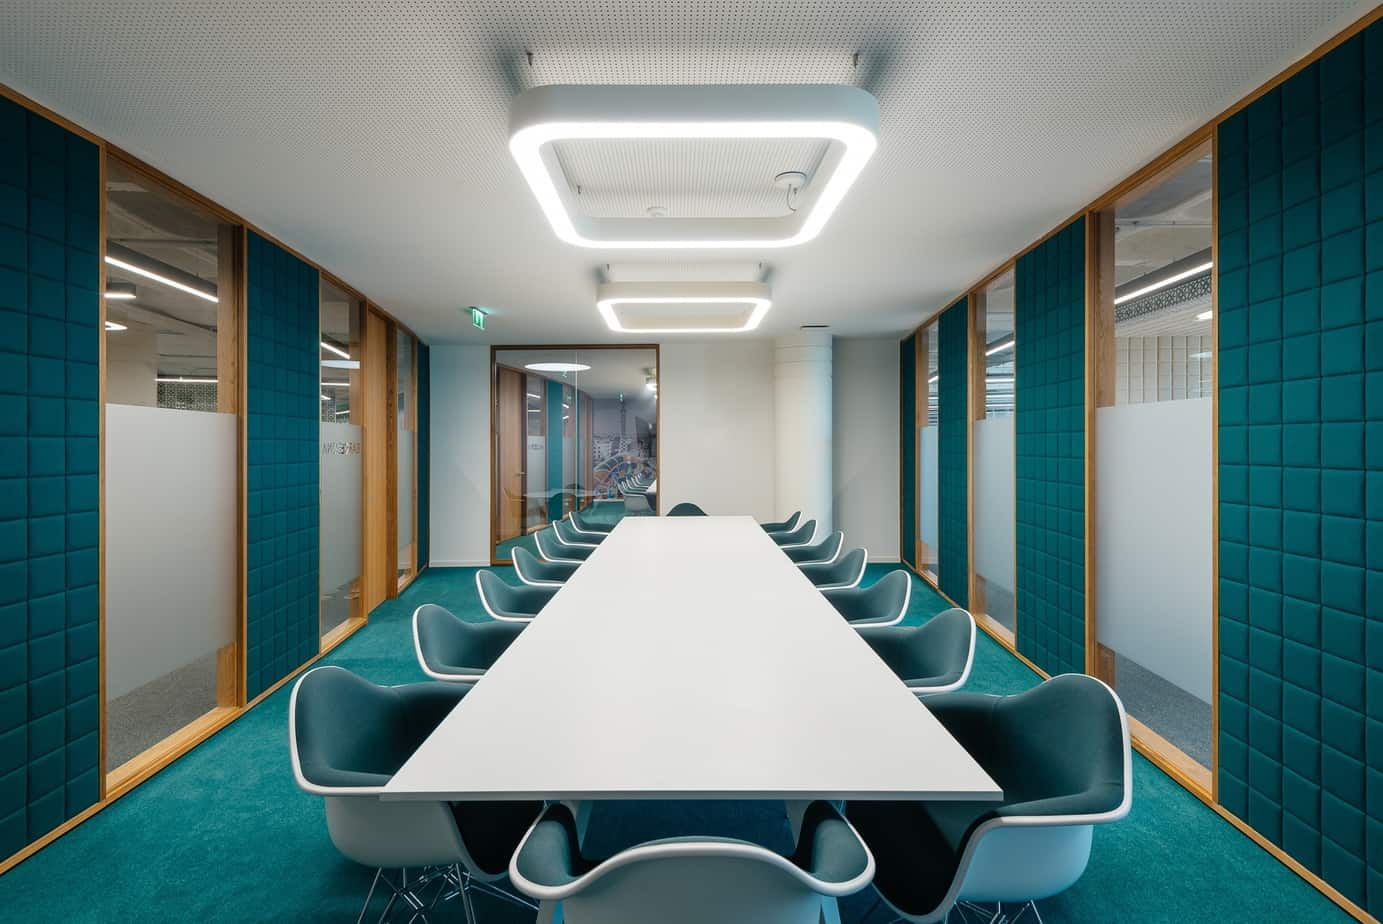 office design color trends 2021 classic blue or aquamarine blue